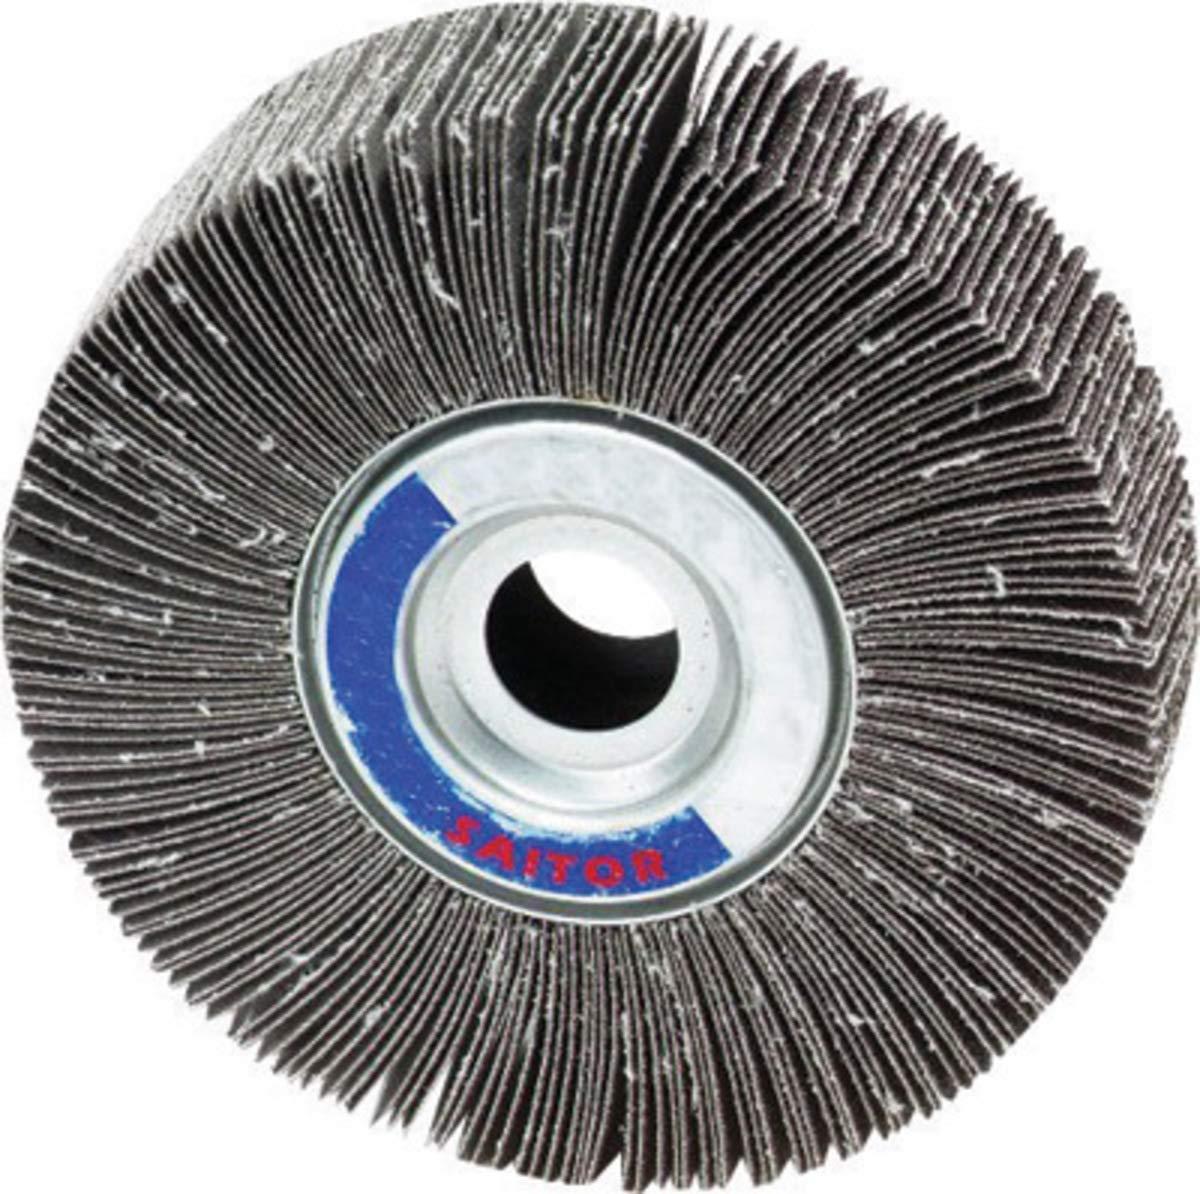 United Abrasives 6'' X 1'' X 1'' 80 Grit 2A Aluminum Oxide Large Coated Flap Wheel - 10 Each/Case